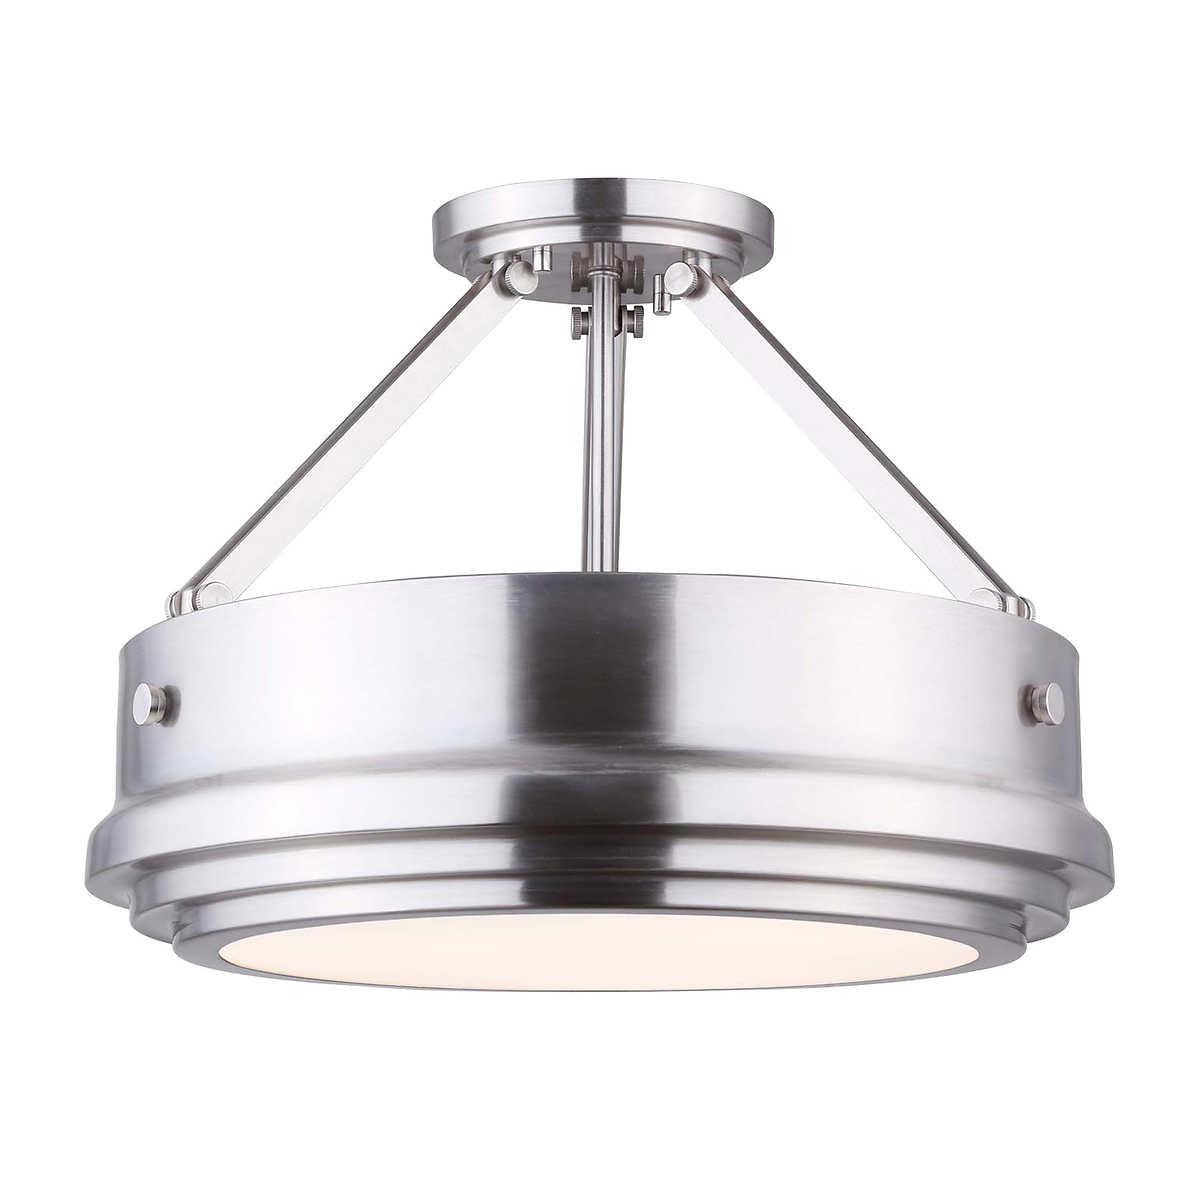 Canarm graidy 3 light semi flush ceiling fixture